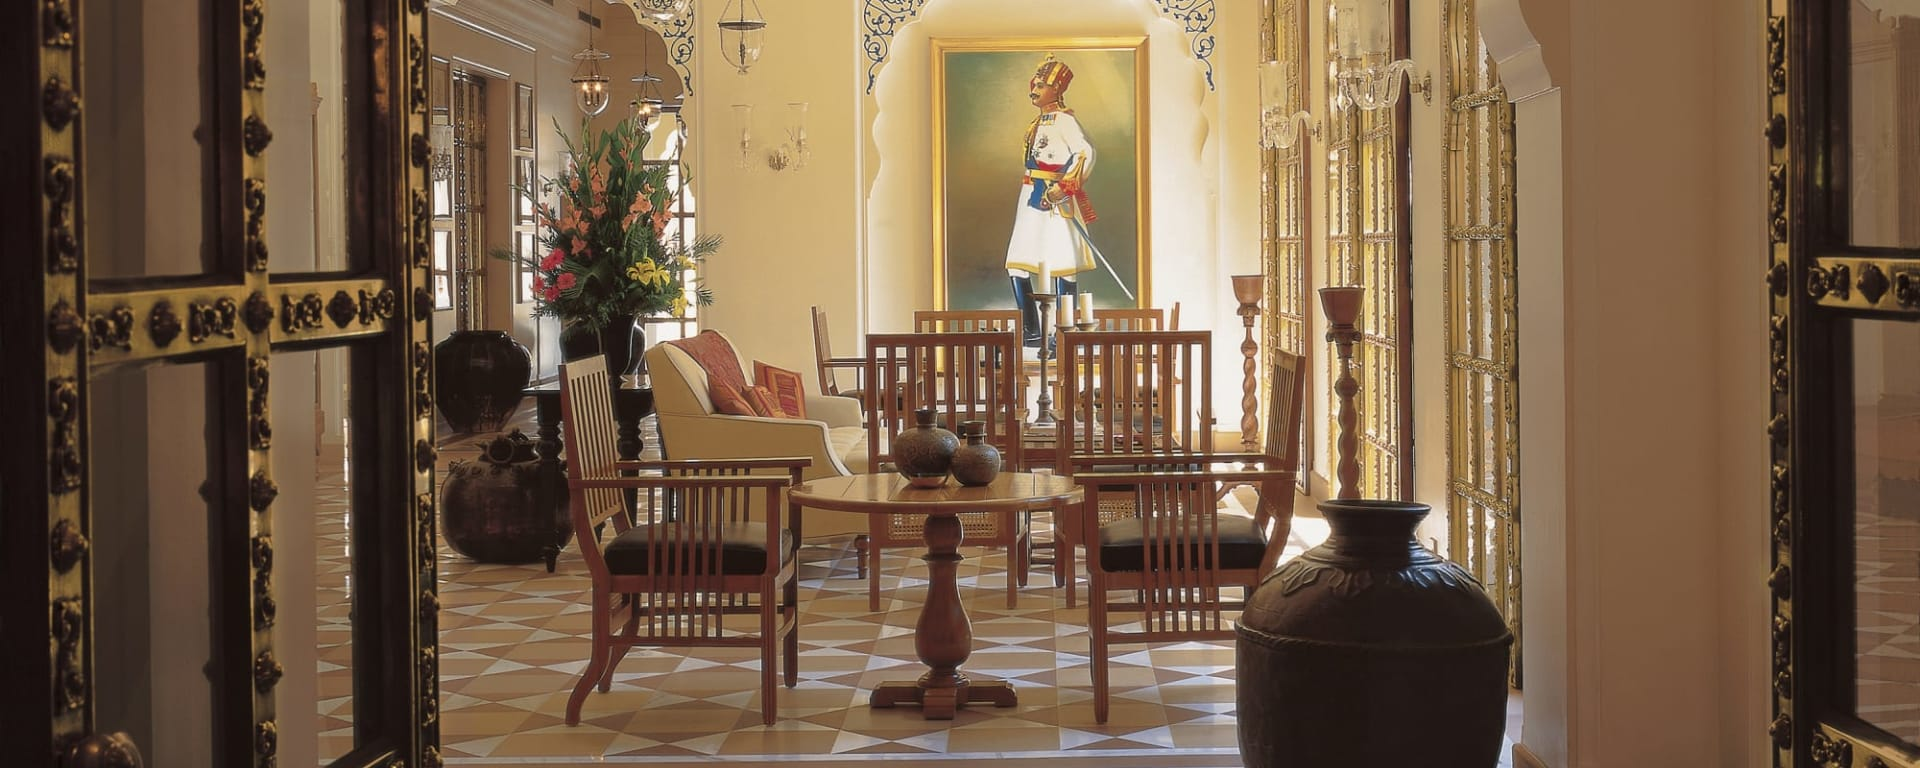 The Oberoi Rajvilas in Jaipur & Umgebung: Jaipur The Oberoi Rajvilas Lobby